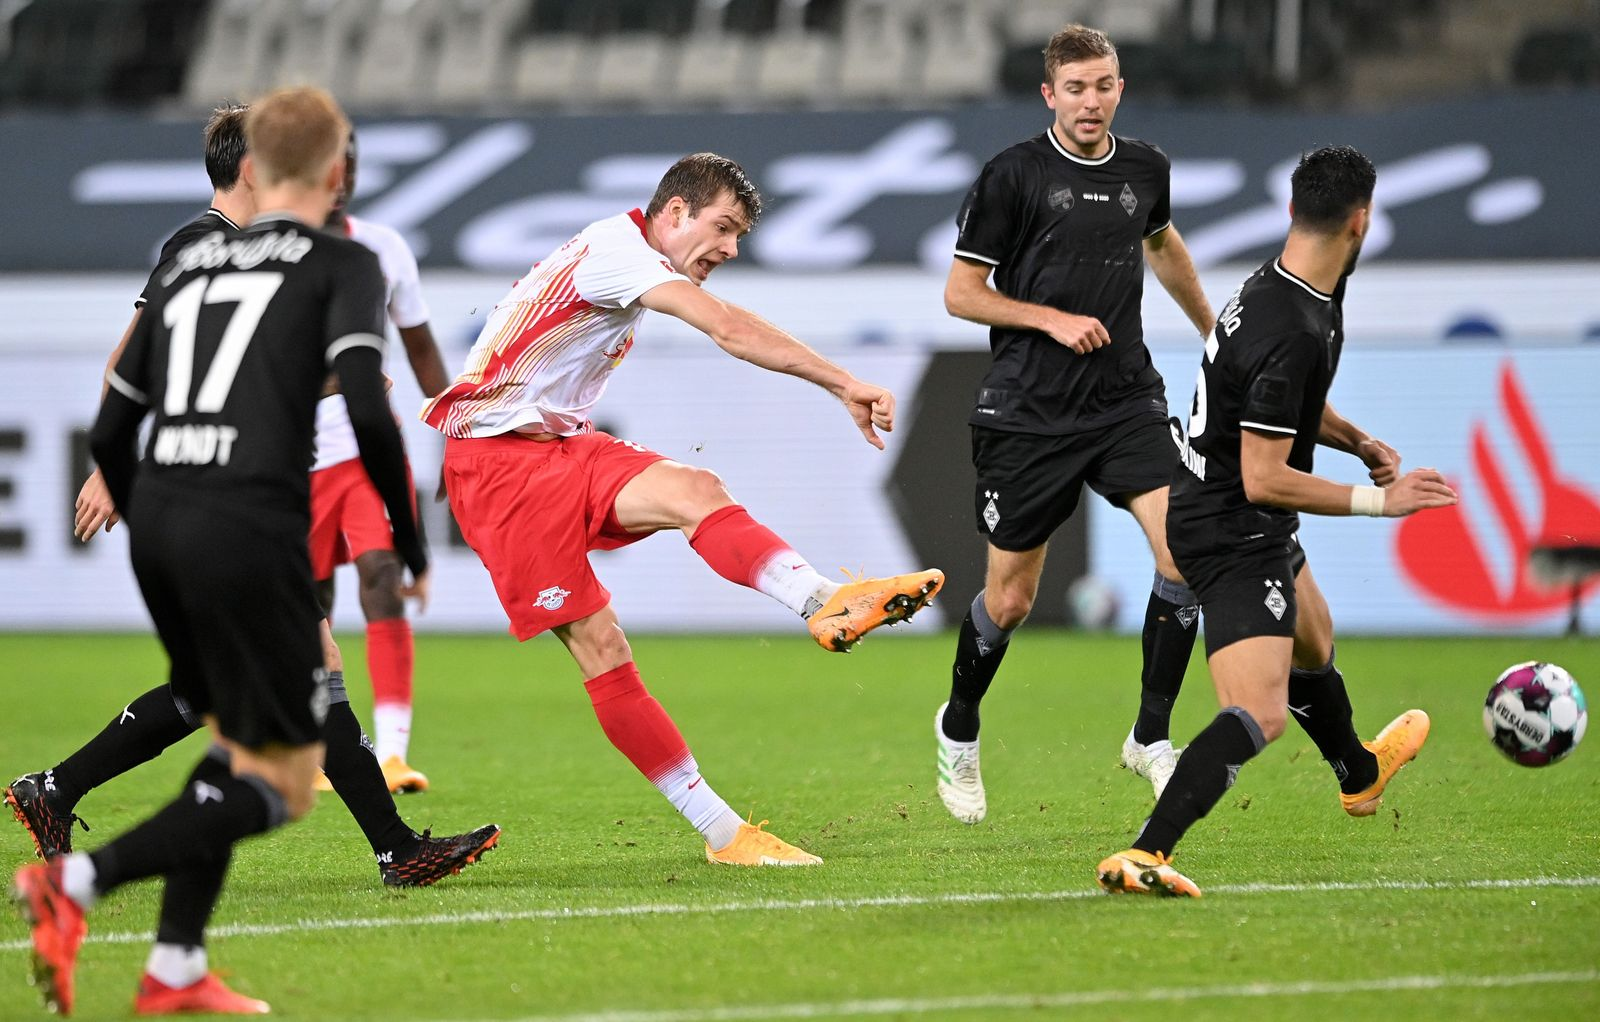 Borussia Moenchengladbach v RB Leipzig, Germany - 31 Oct 2020